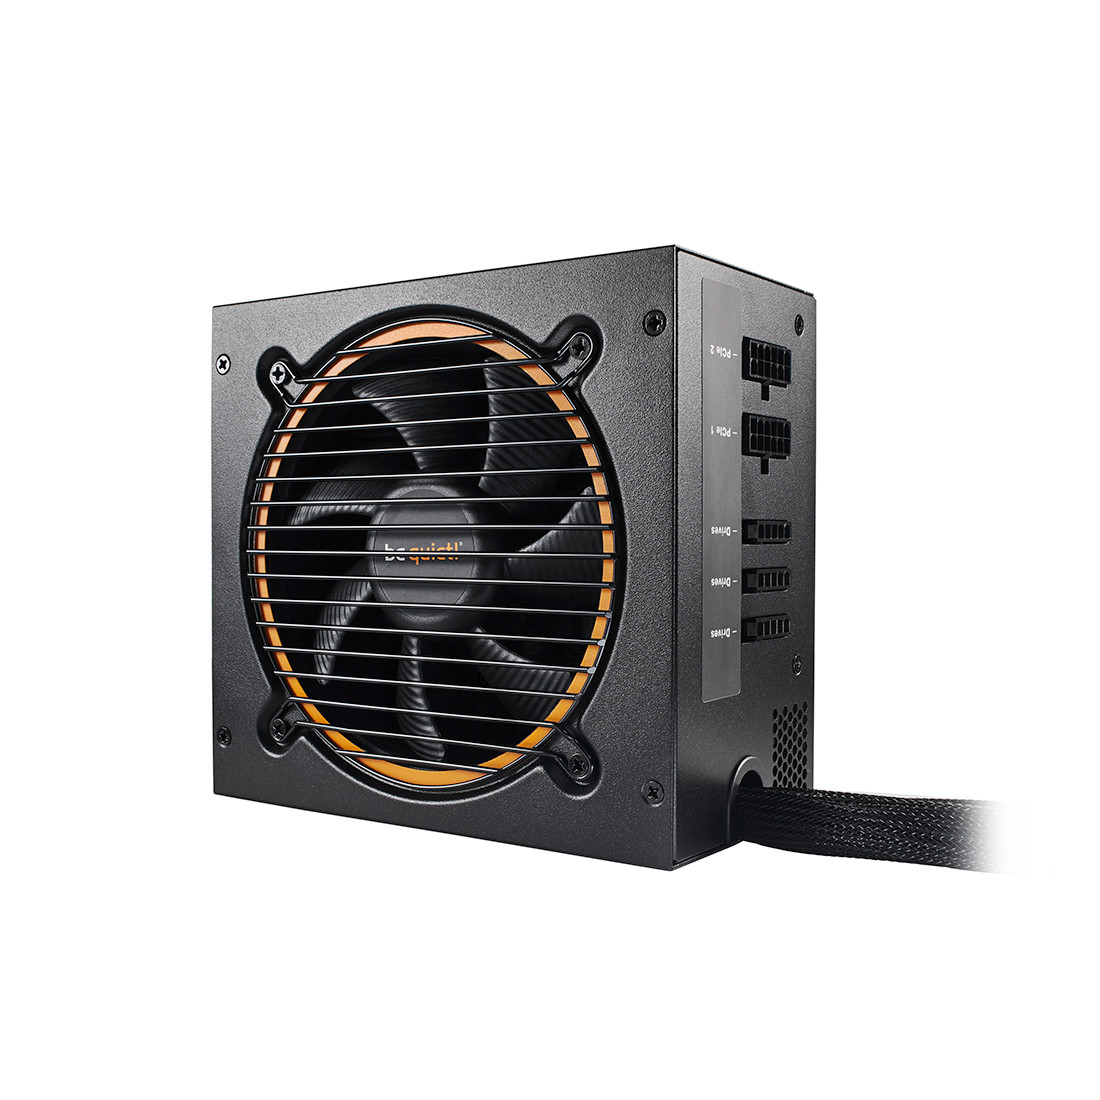 Блок питания Bequiet! Pure Power 11 500W CM L11-CM-500W BN297 Блок питания, Bequiet!, Pure Power 11